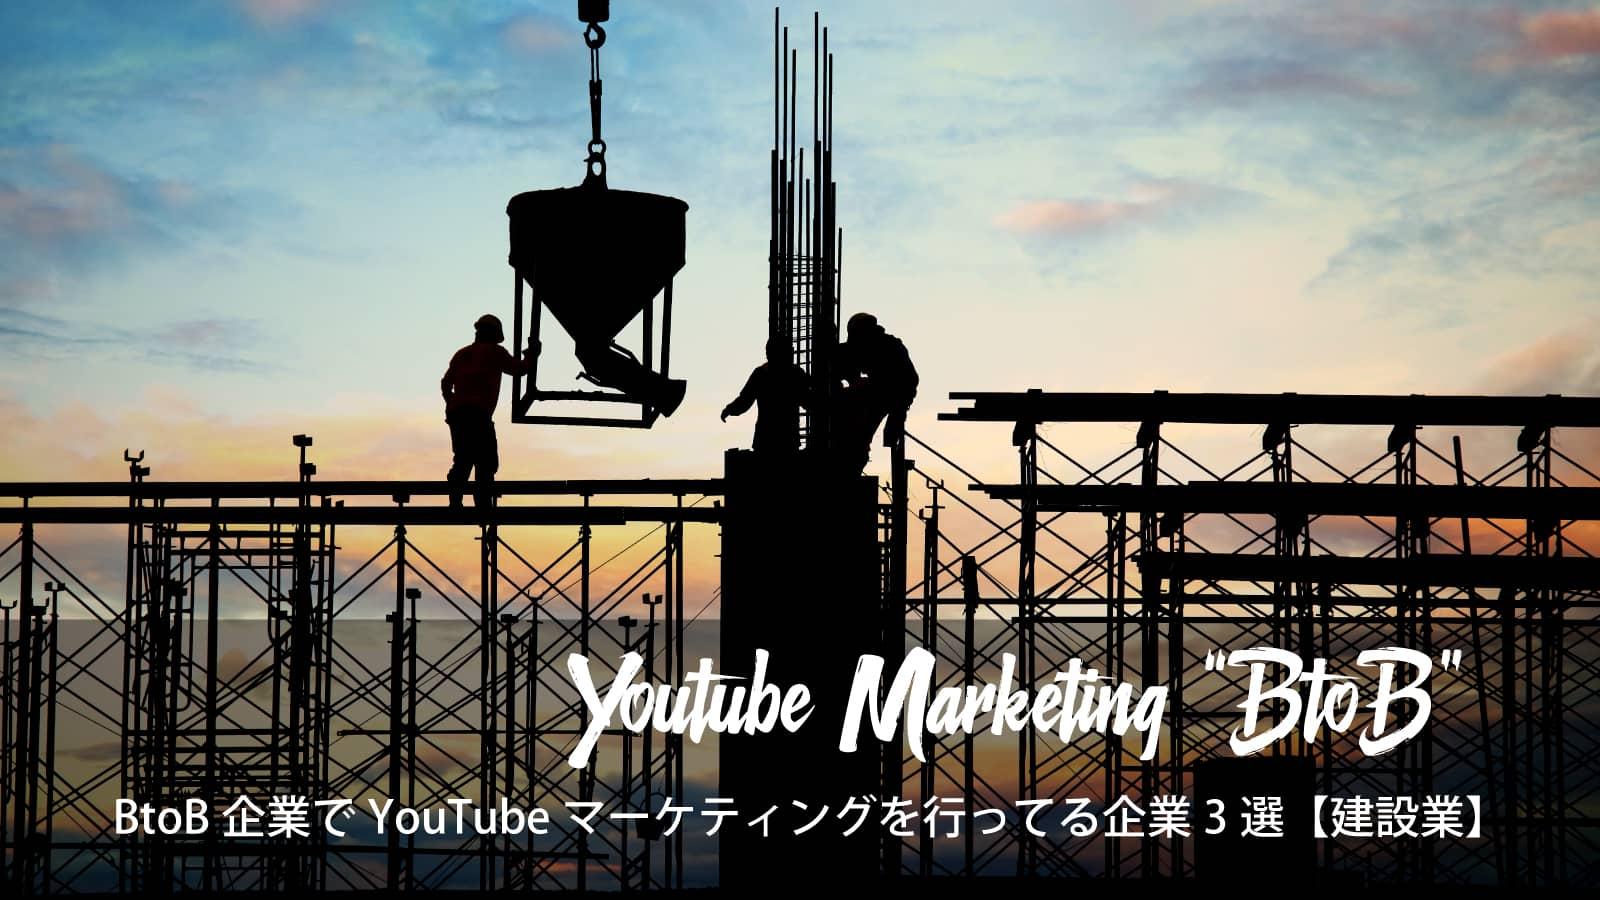 BtoB企業でYouTubeマーケティングを行っている企業3選【建設業】